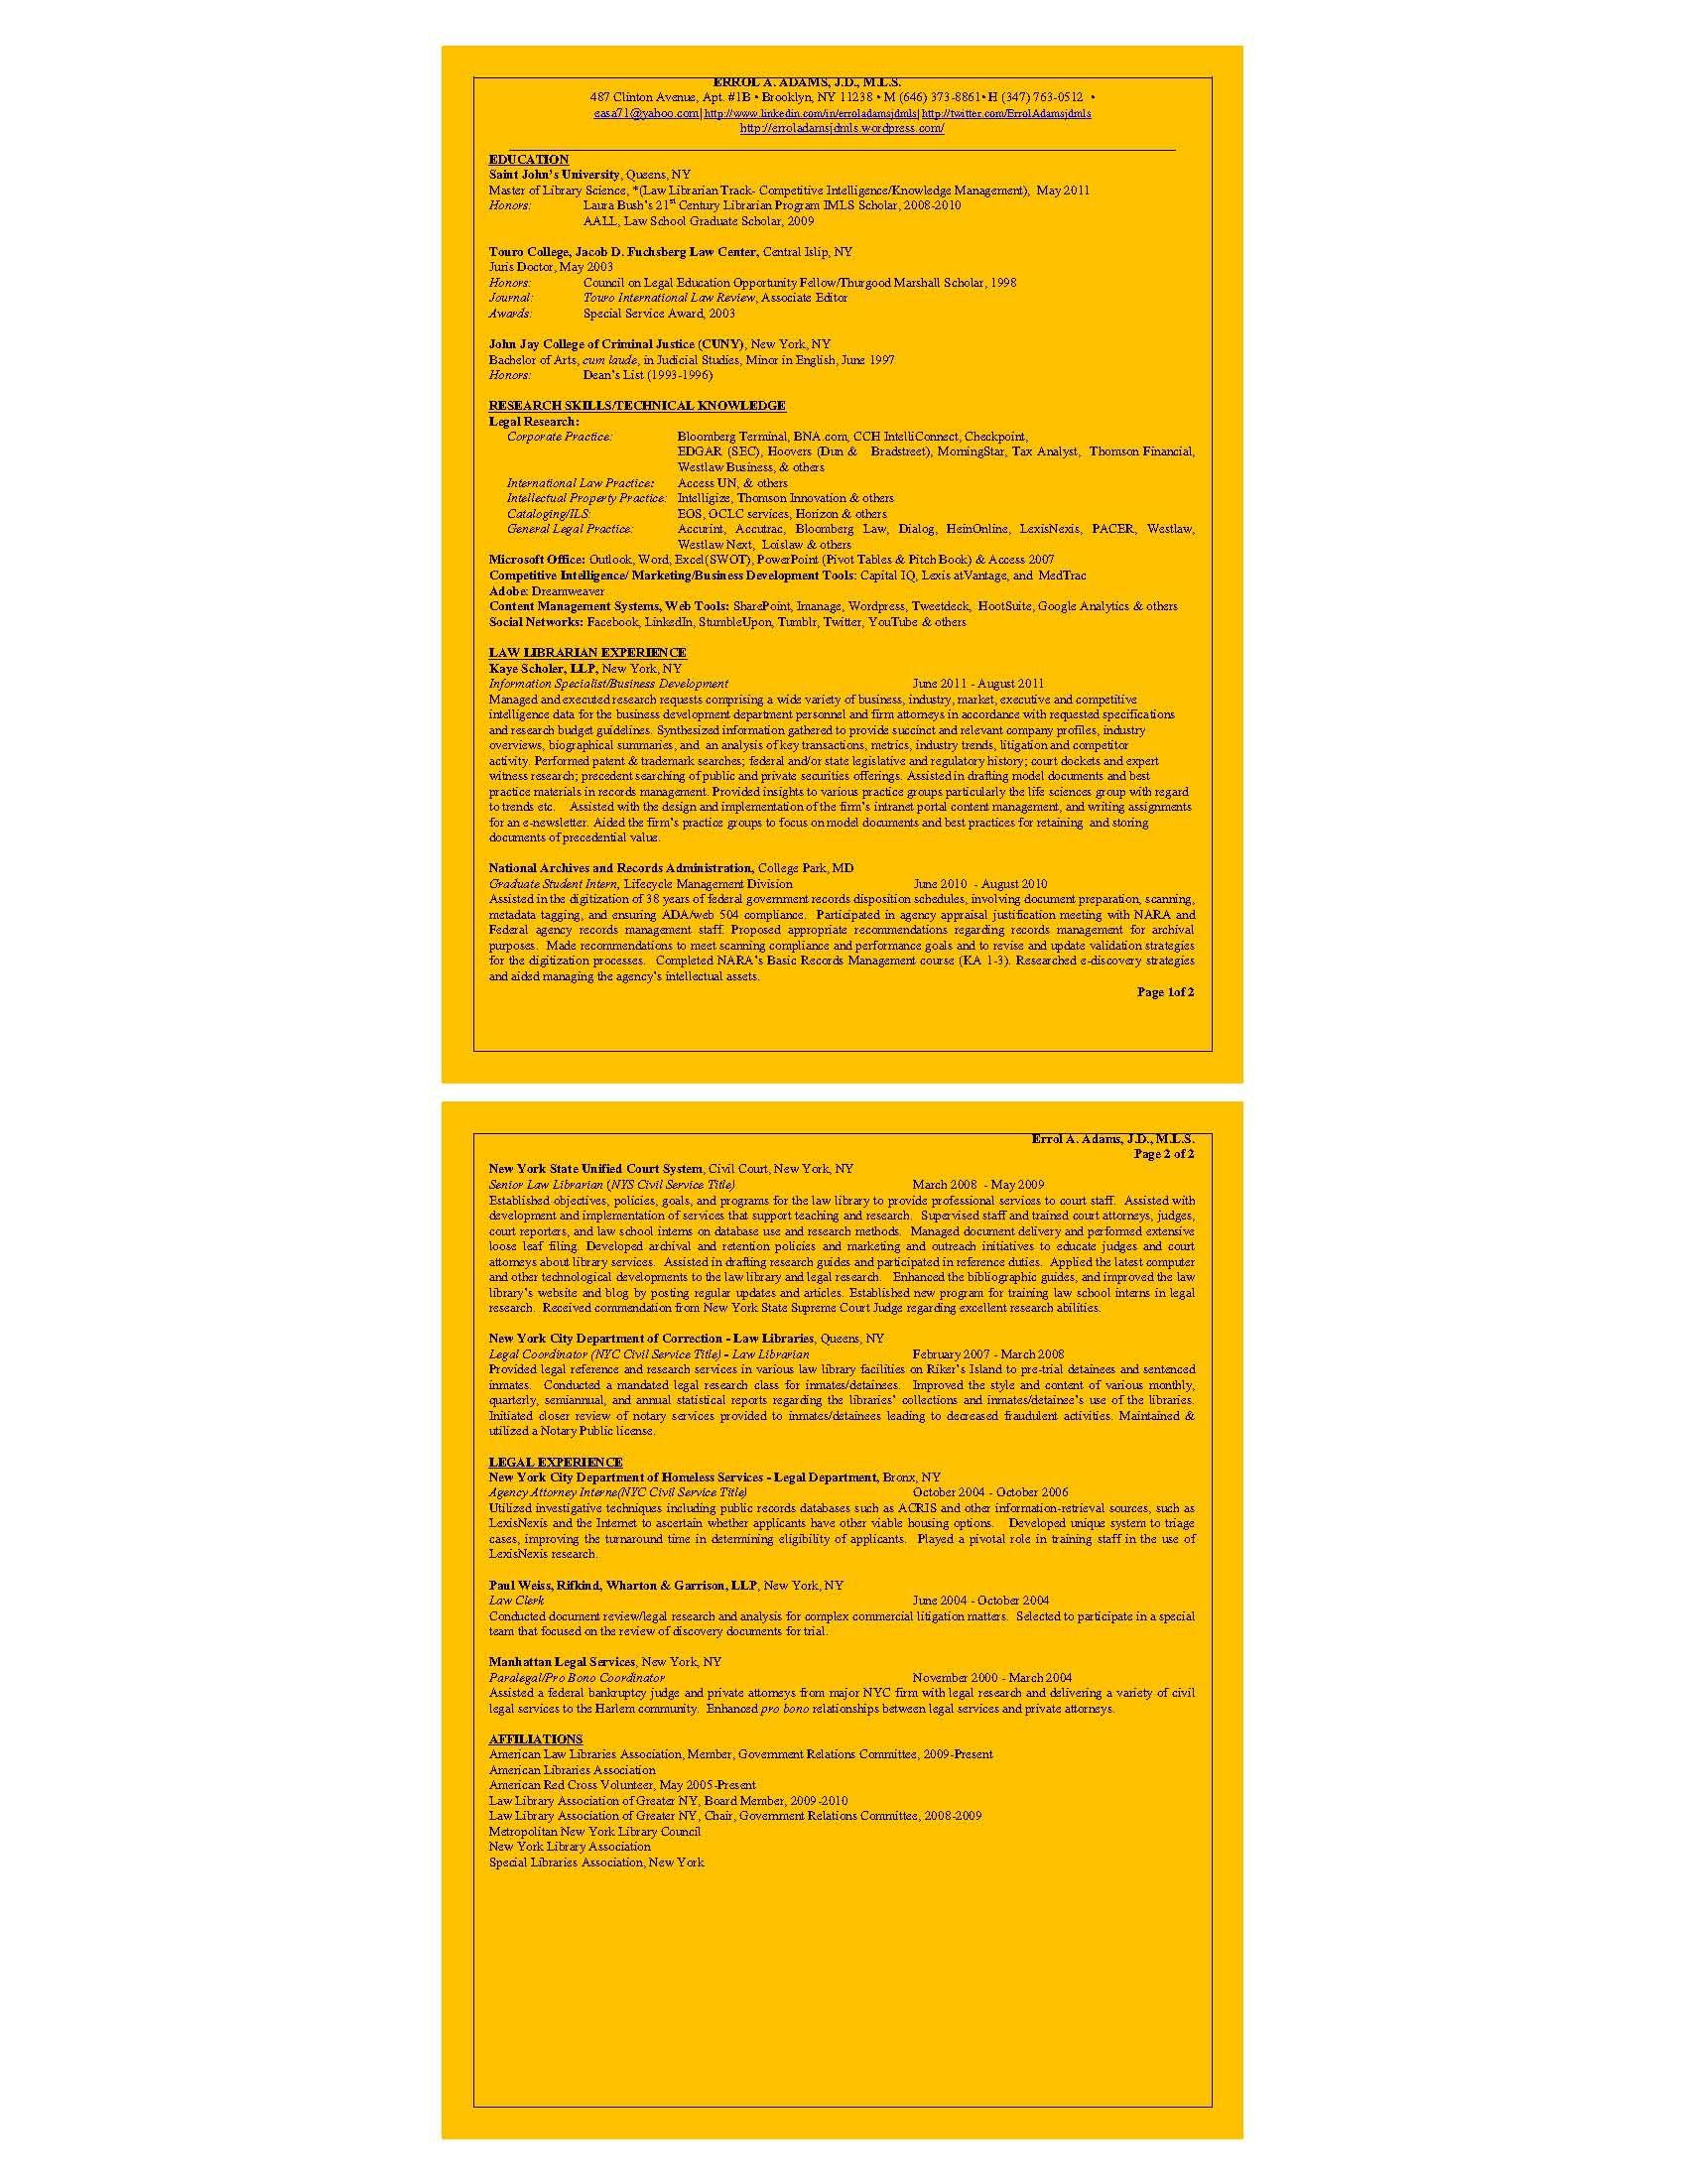 Errol A Adams Resume Pdf Resume Pdf Infographic Resume Resume